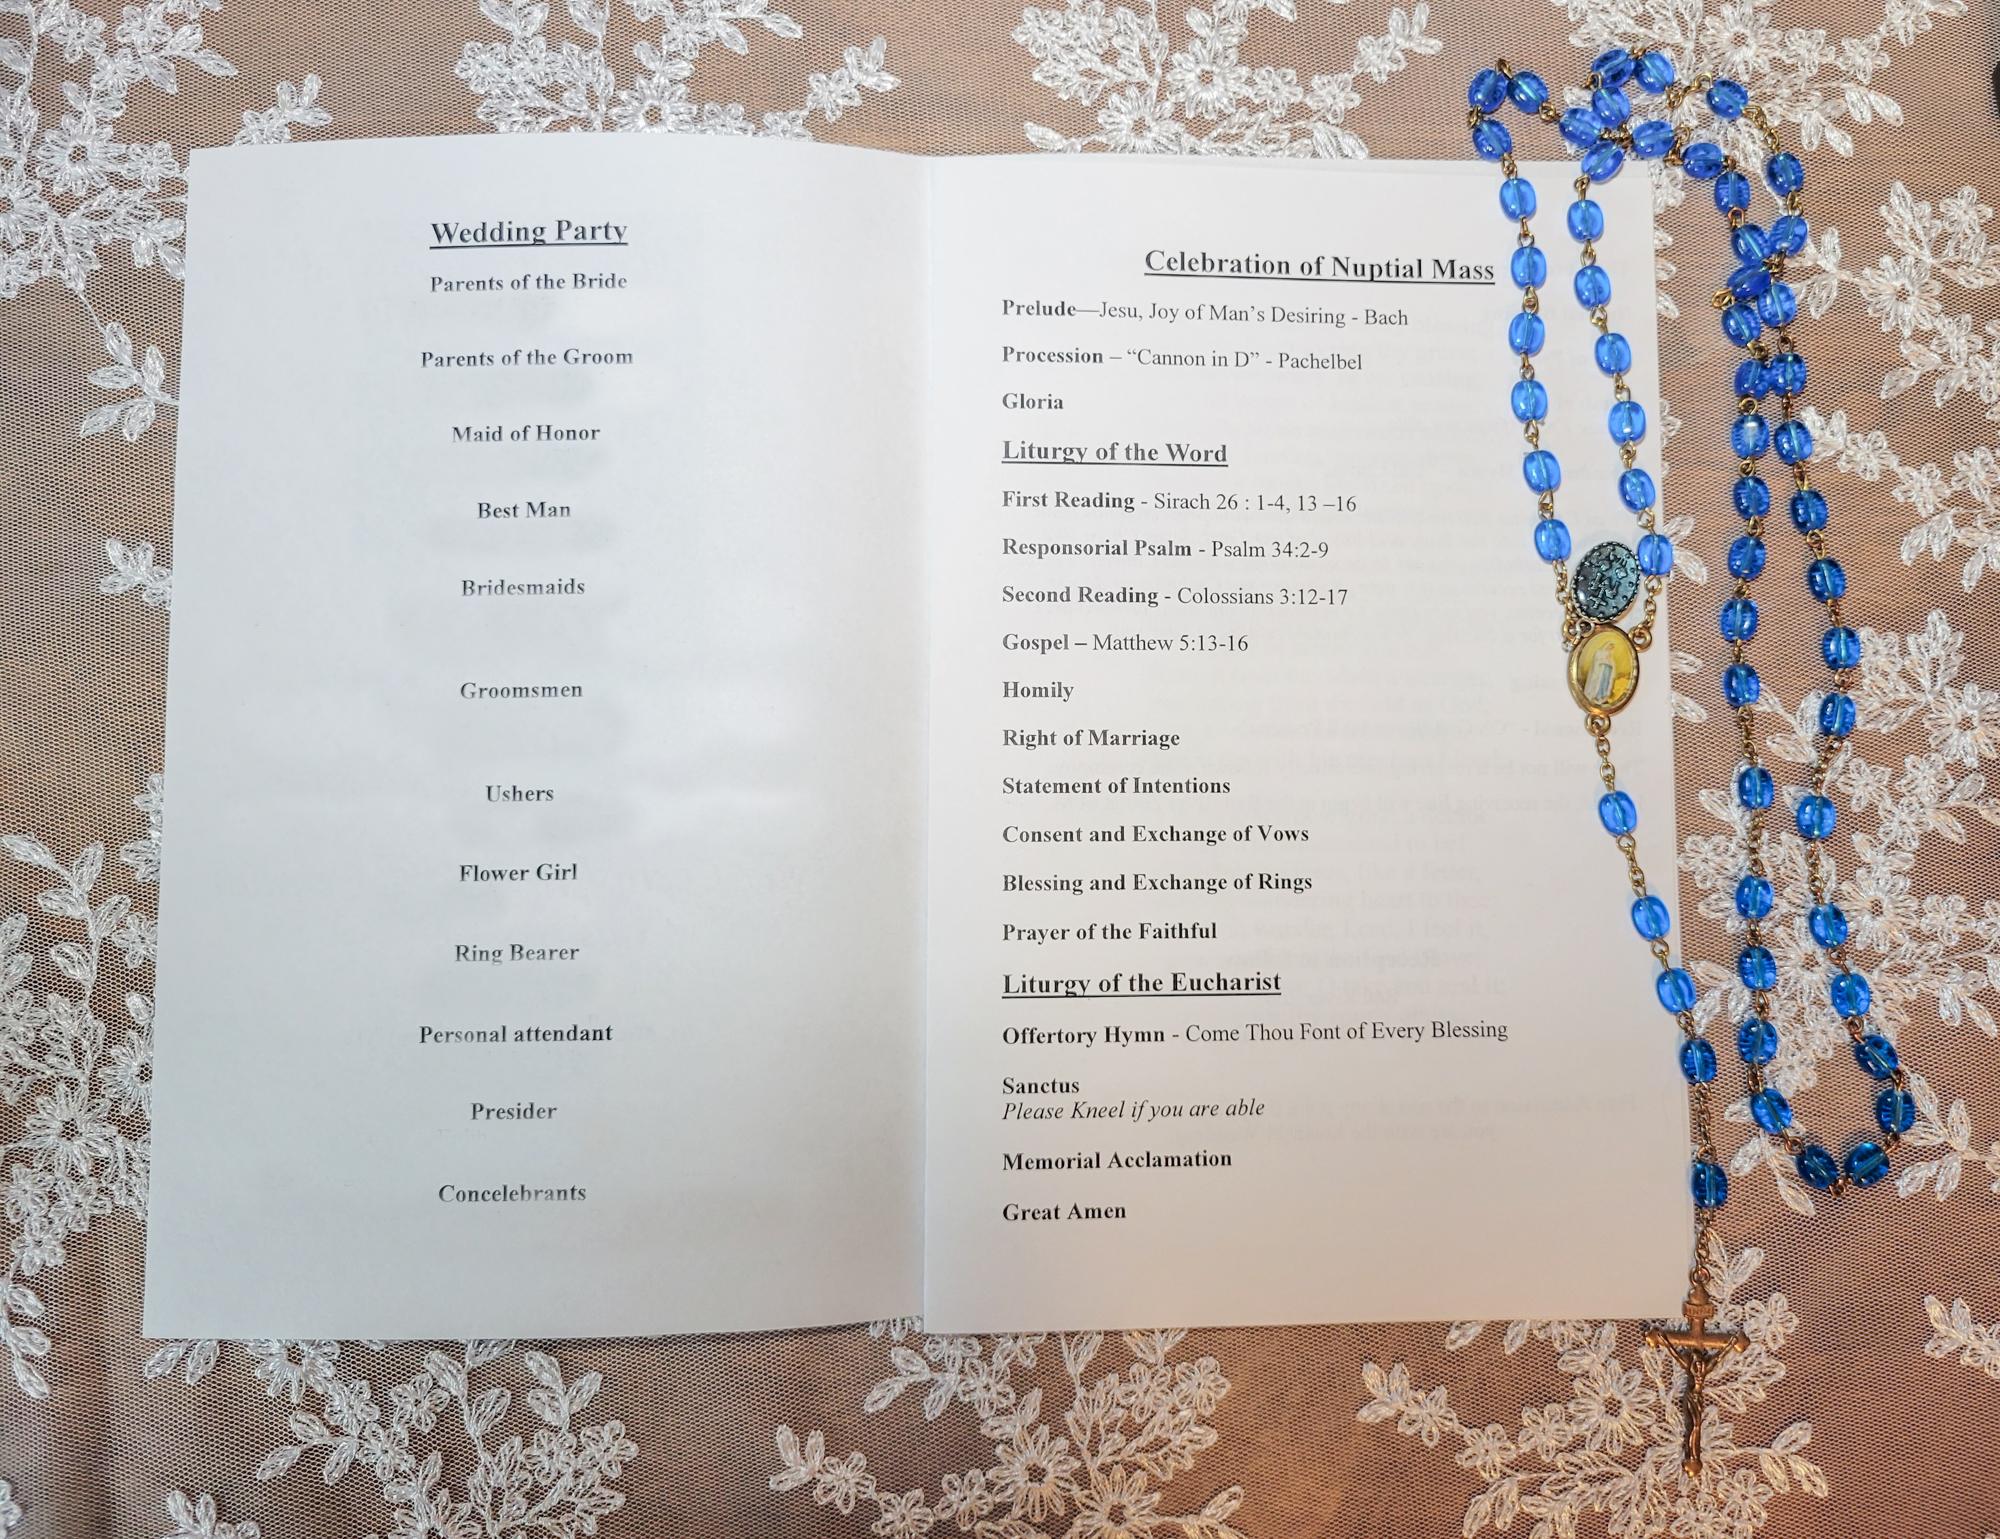 20210728 115443 - How to Create A Catholic Wedding Program